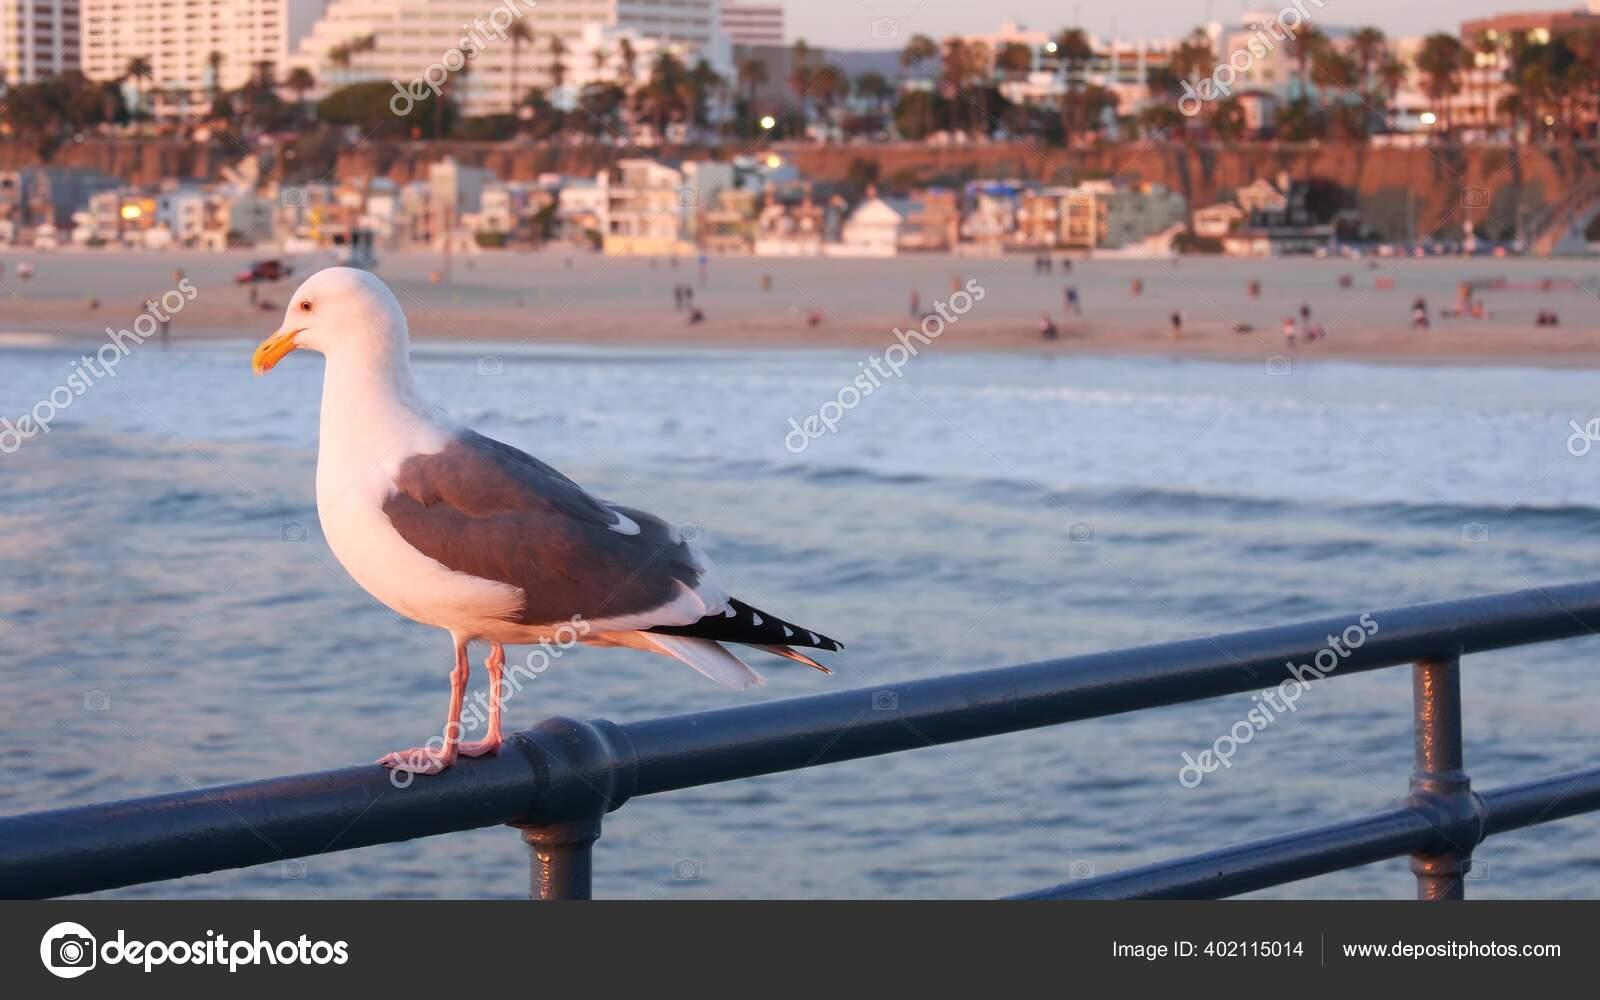 California Summertime Beach Aesthetic Pink Sunset Cute Funny Sea Gull Stock Photo Image By C Dogorasun 402115014